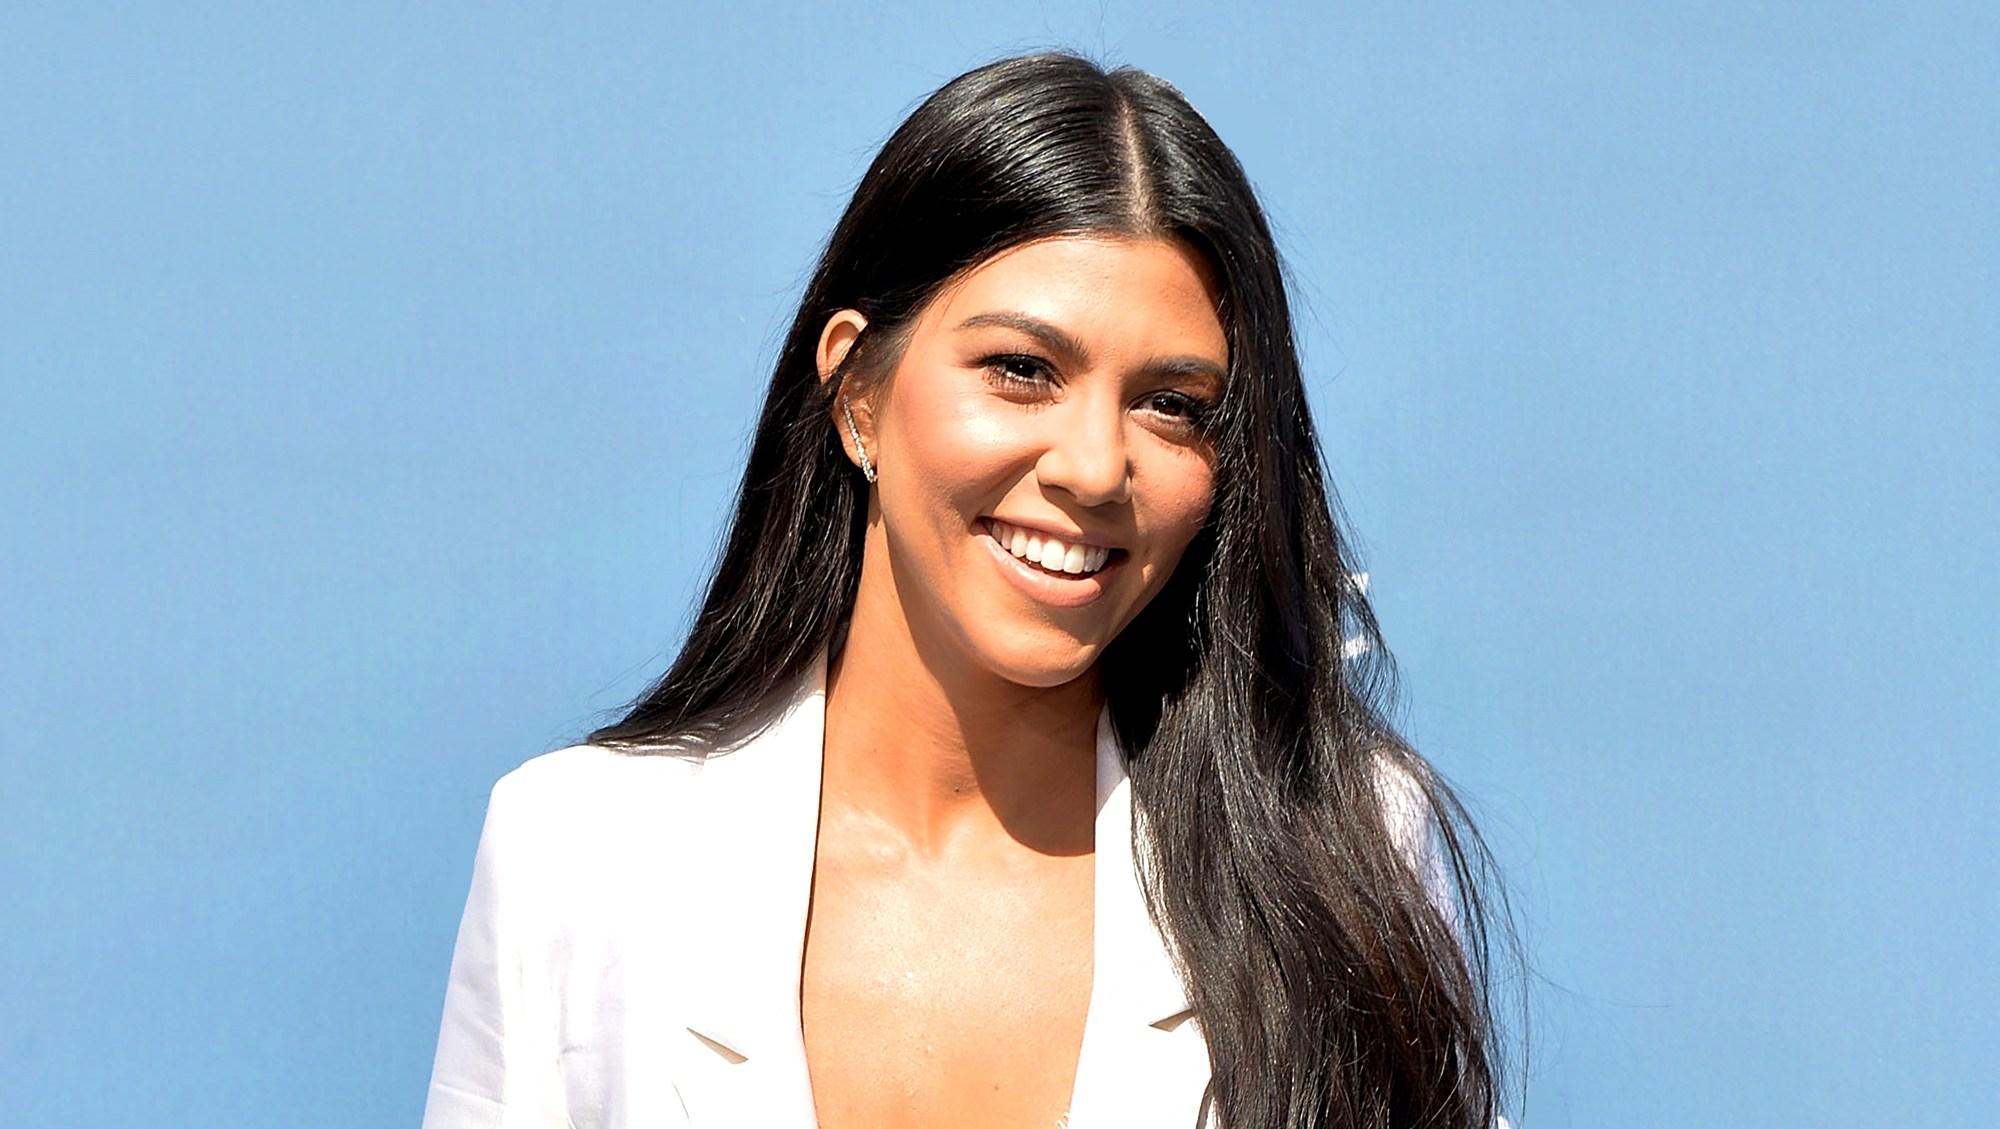 Kourtney Kardashian attends the NBCUniversal 2016 Upfront Presentation in New York City.